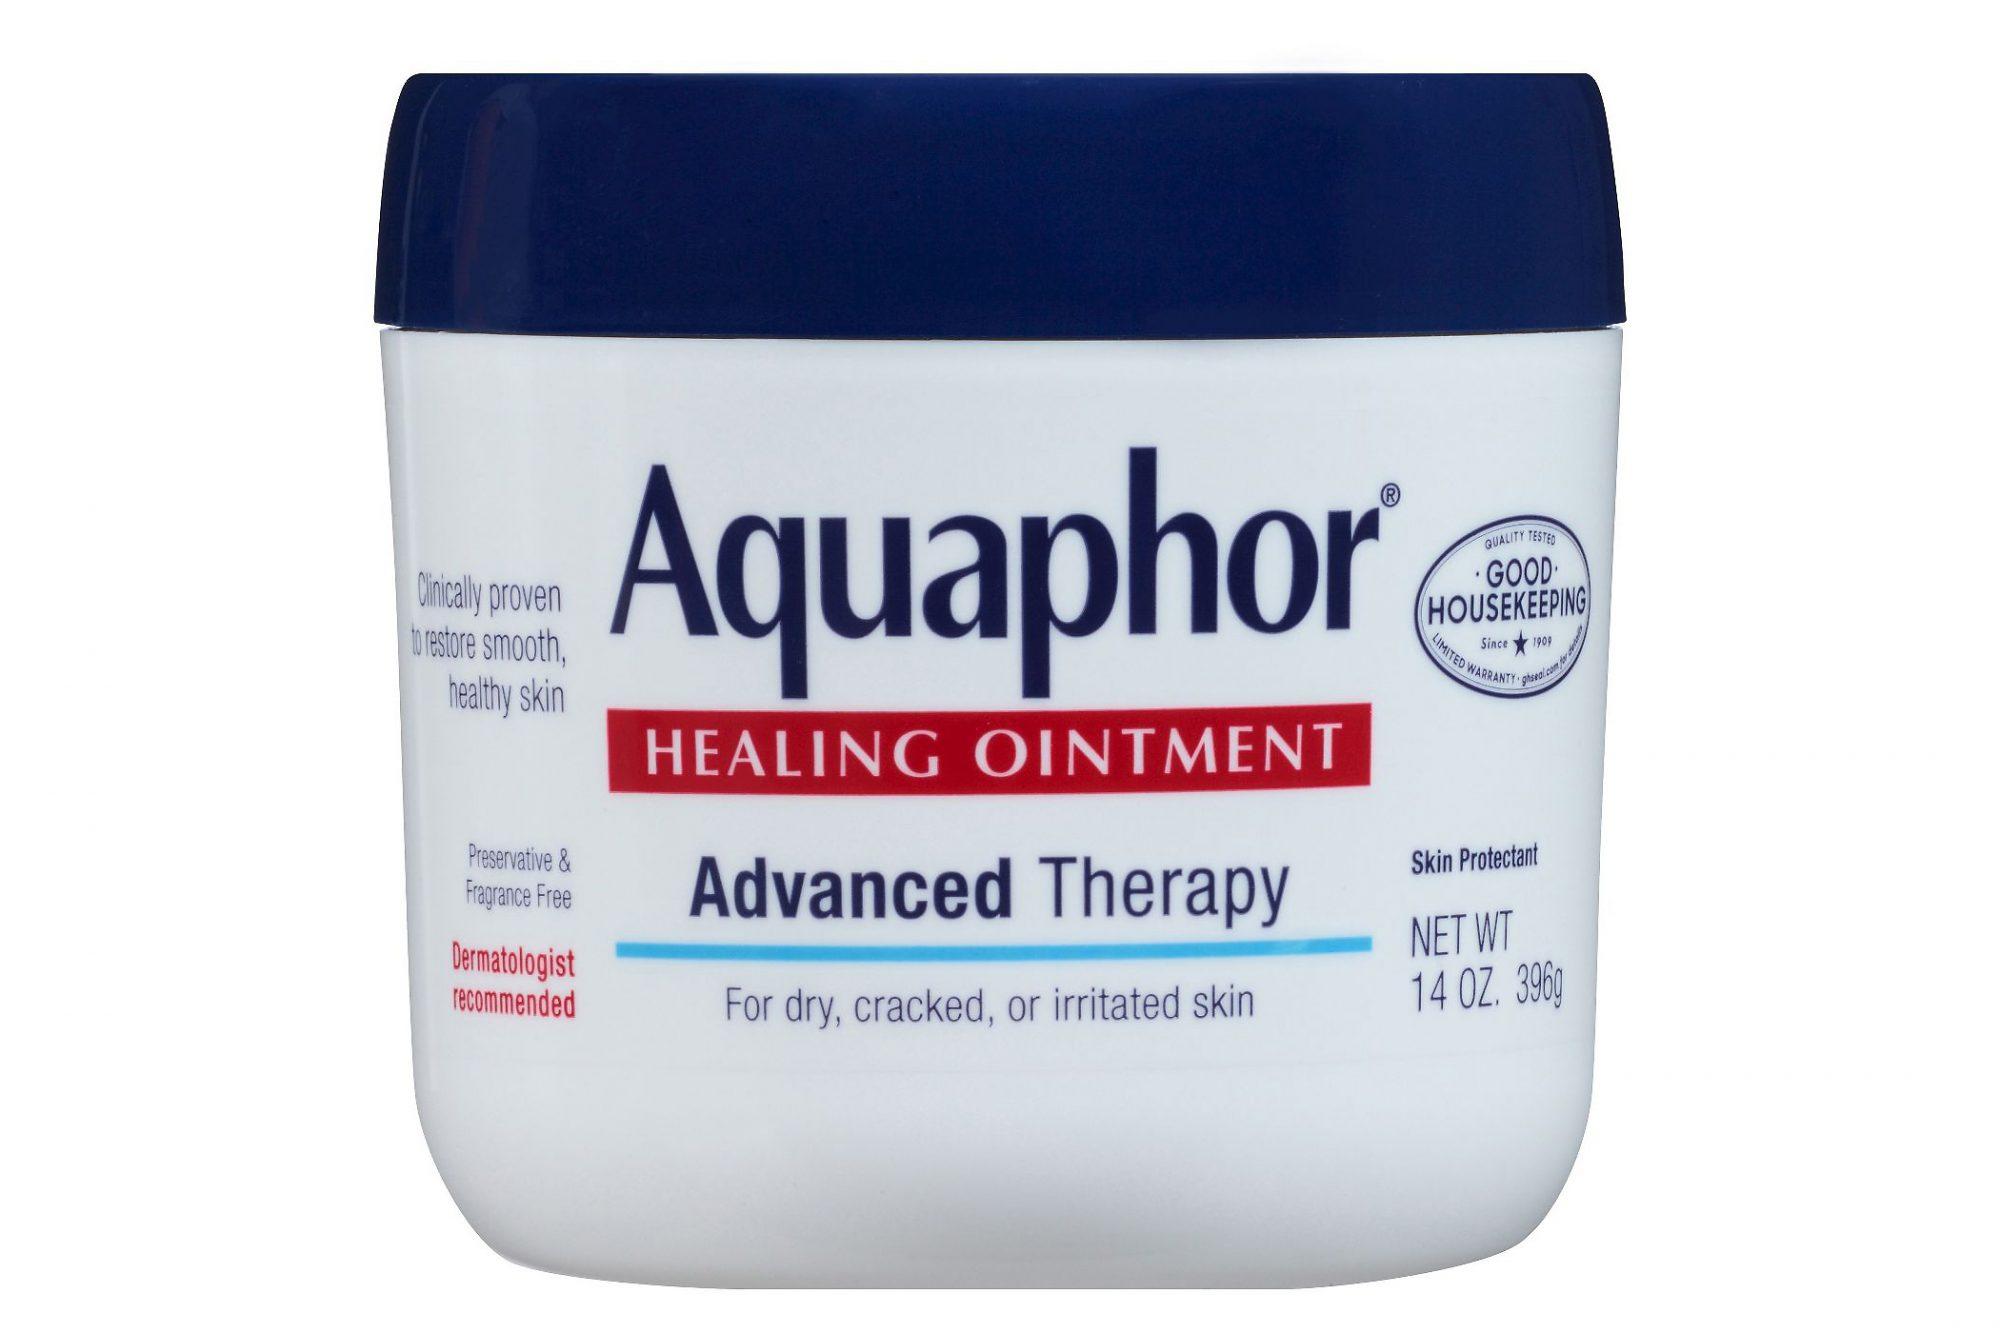 over-exfoliation-aquaphor